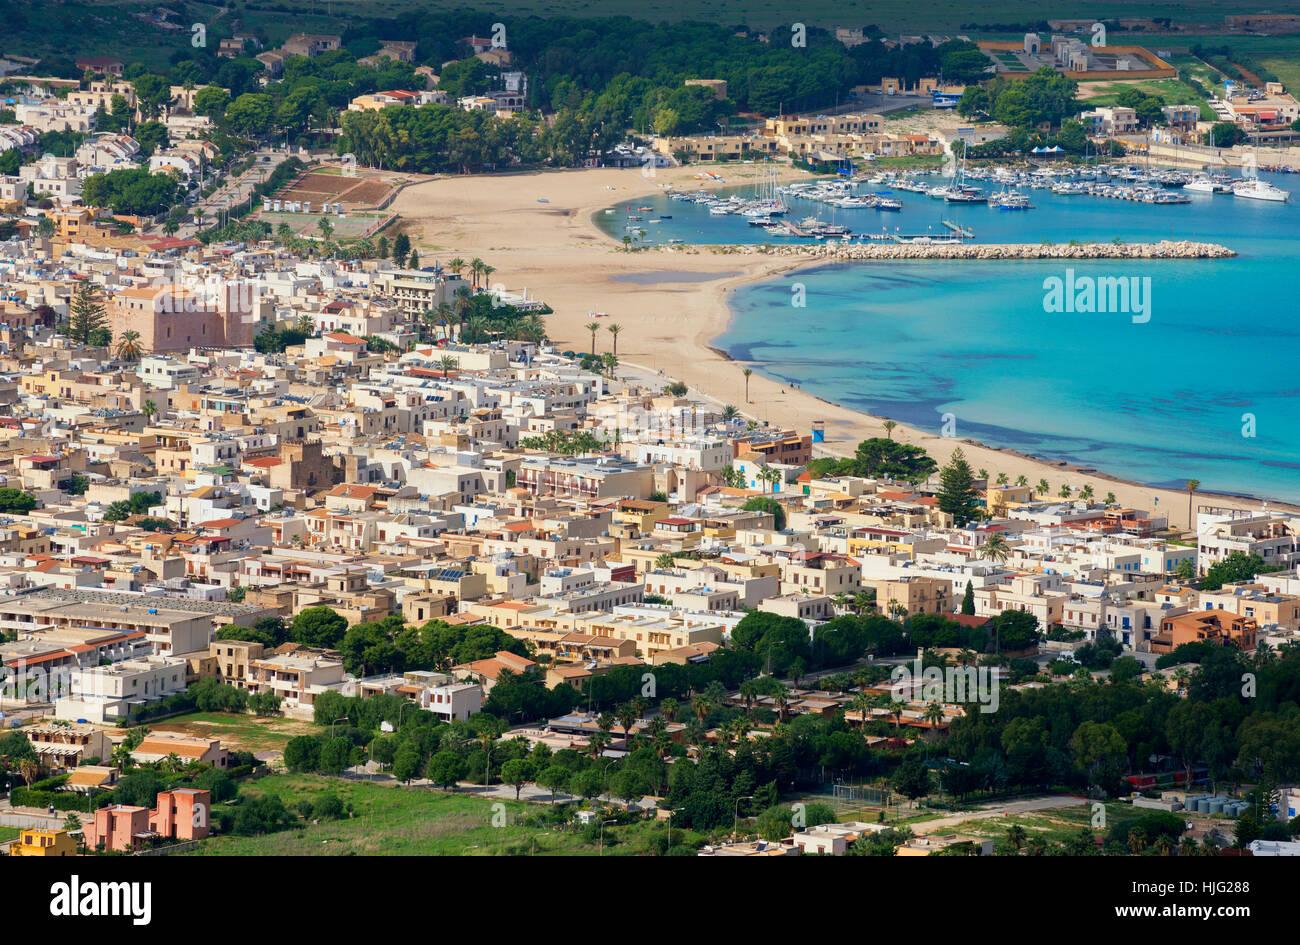 San Vito lo Capo, Luftaufnahme, Sizilien, Italien Stockbild